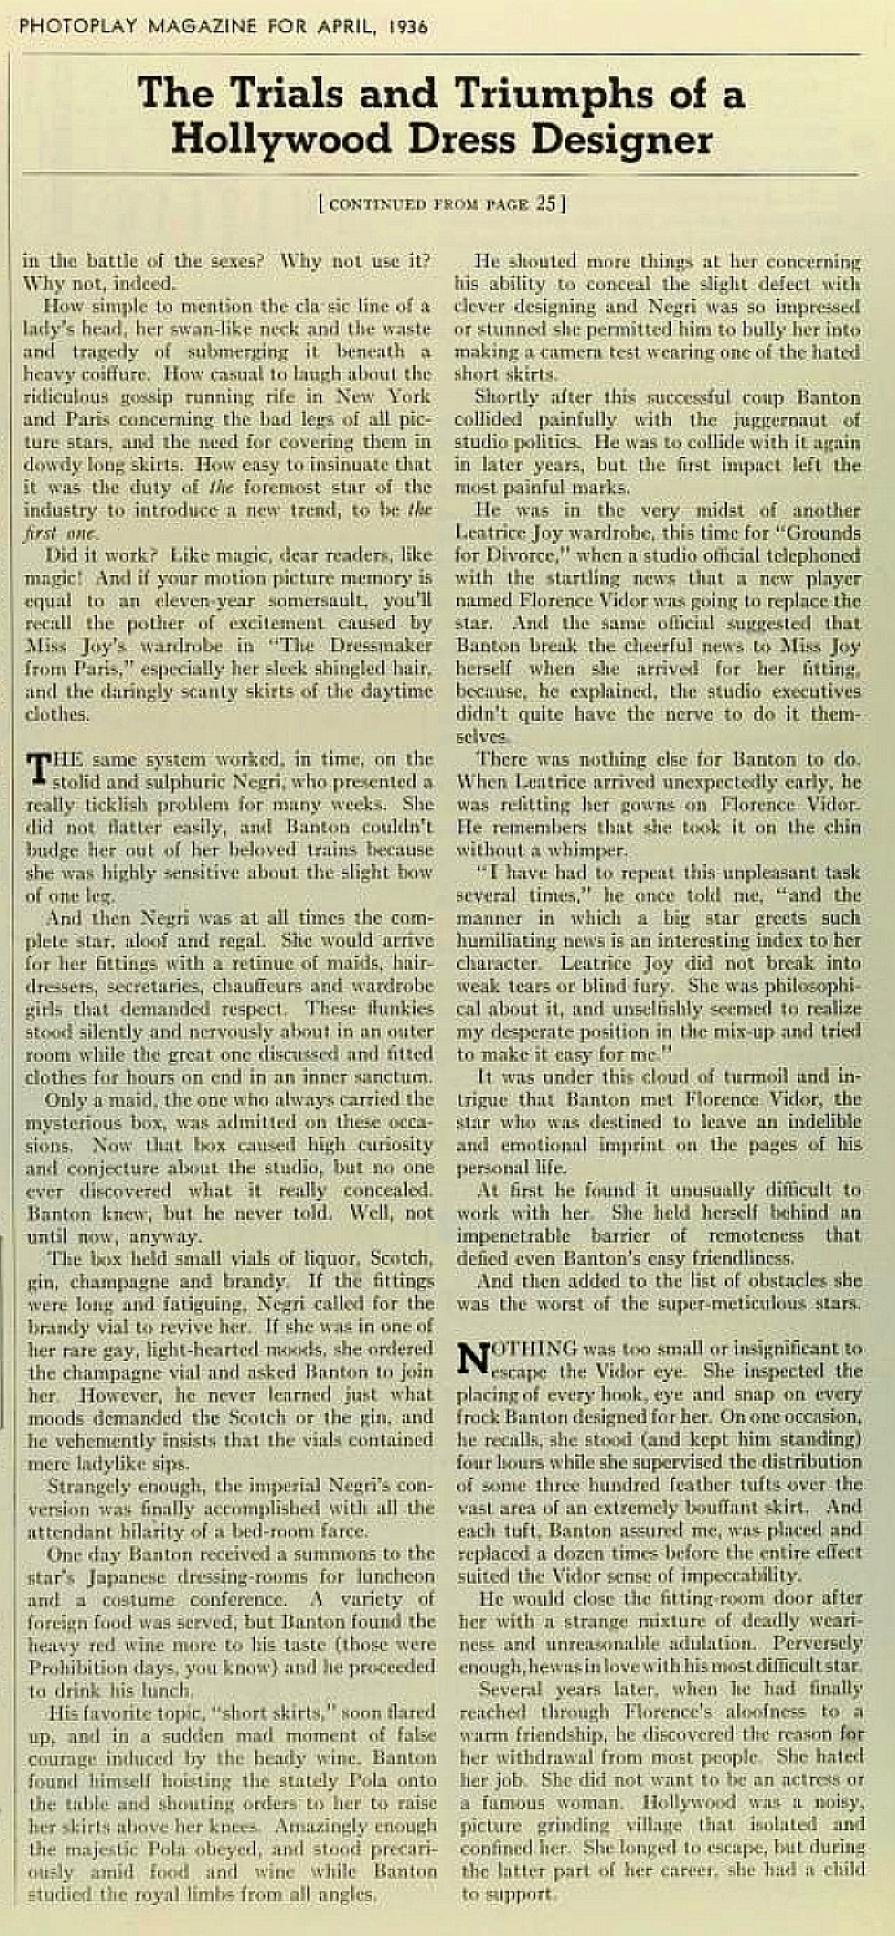 carole lombard photoplay april 1936 travis banton 03a larger